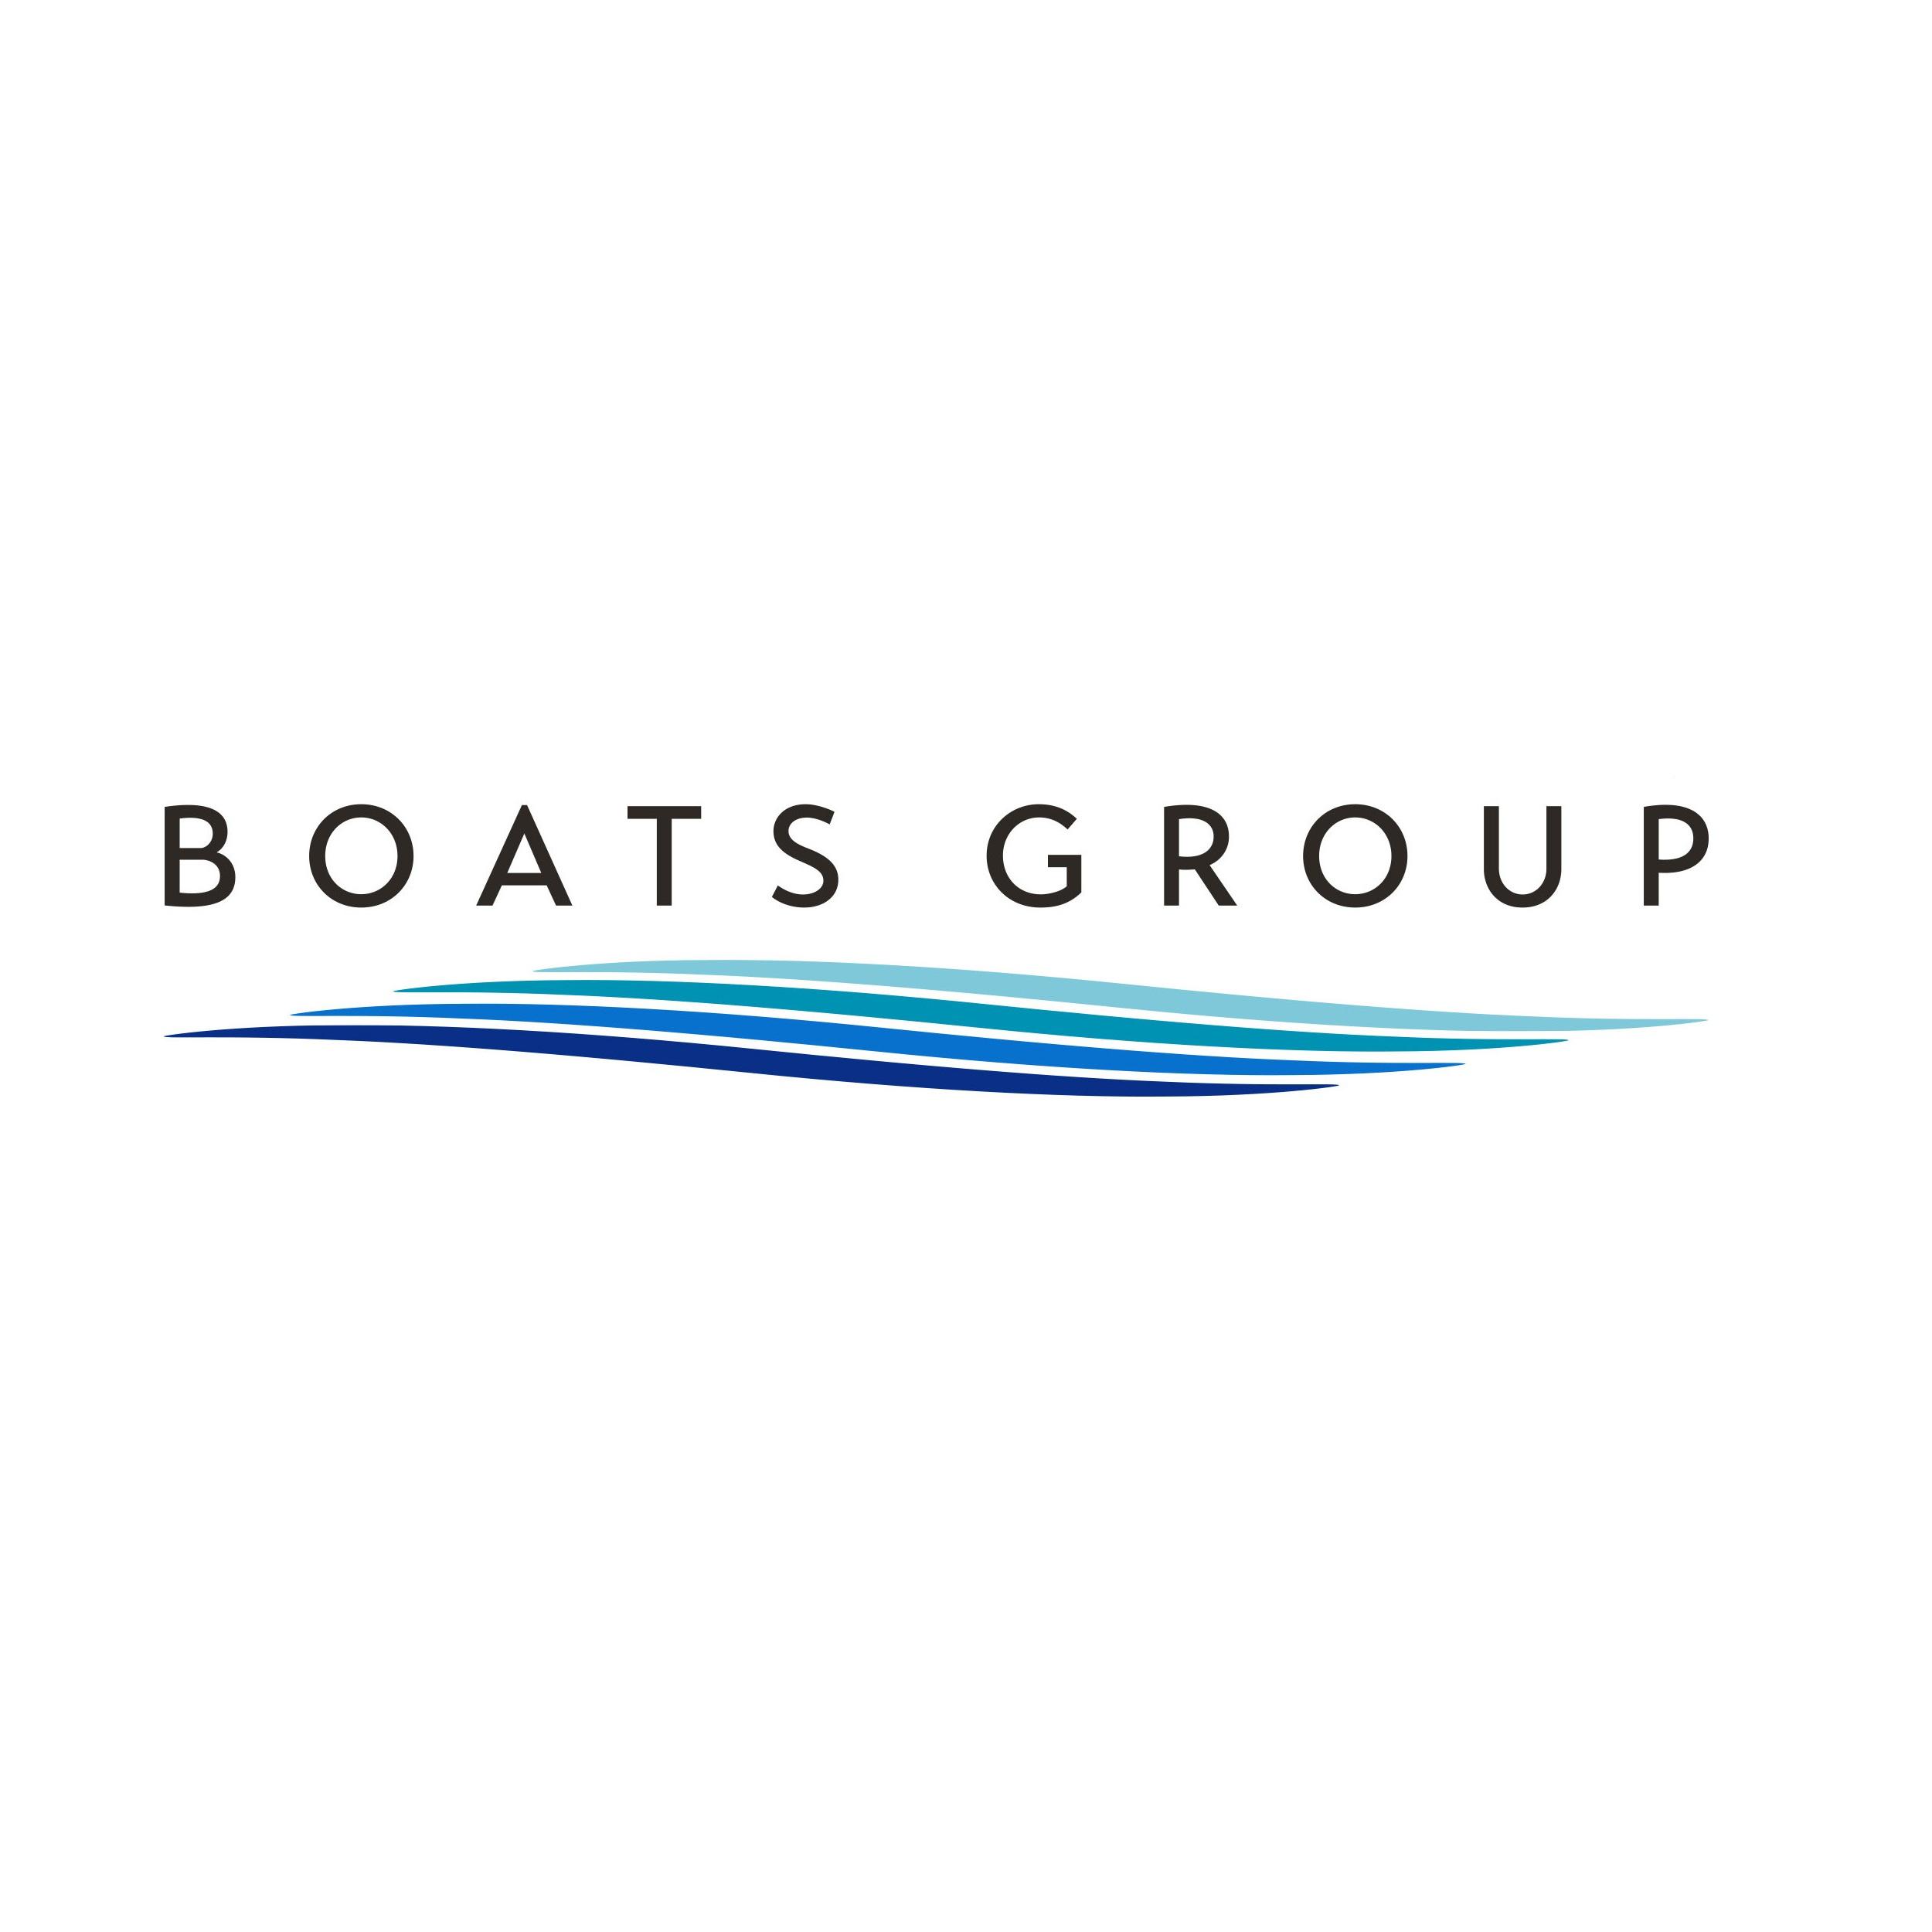 boatsgroup.jpg